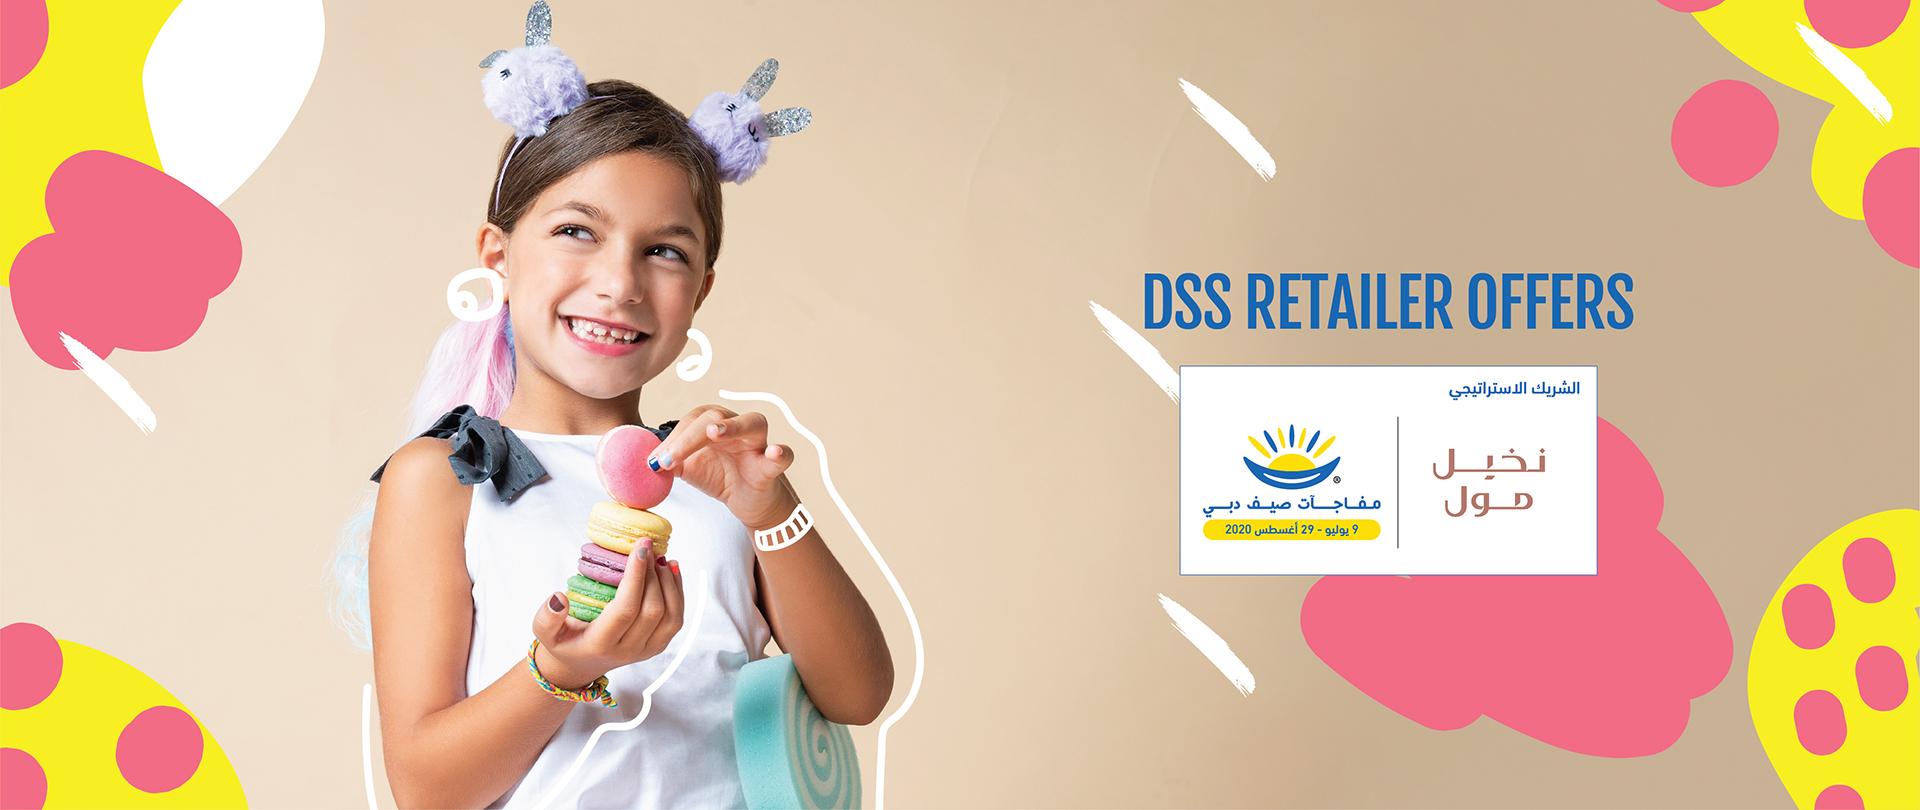 DSS Retailer Offer